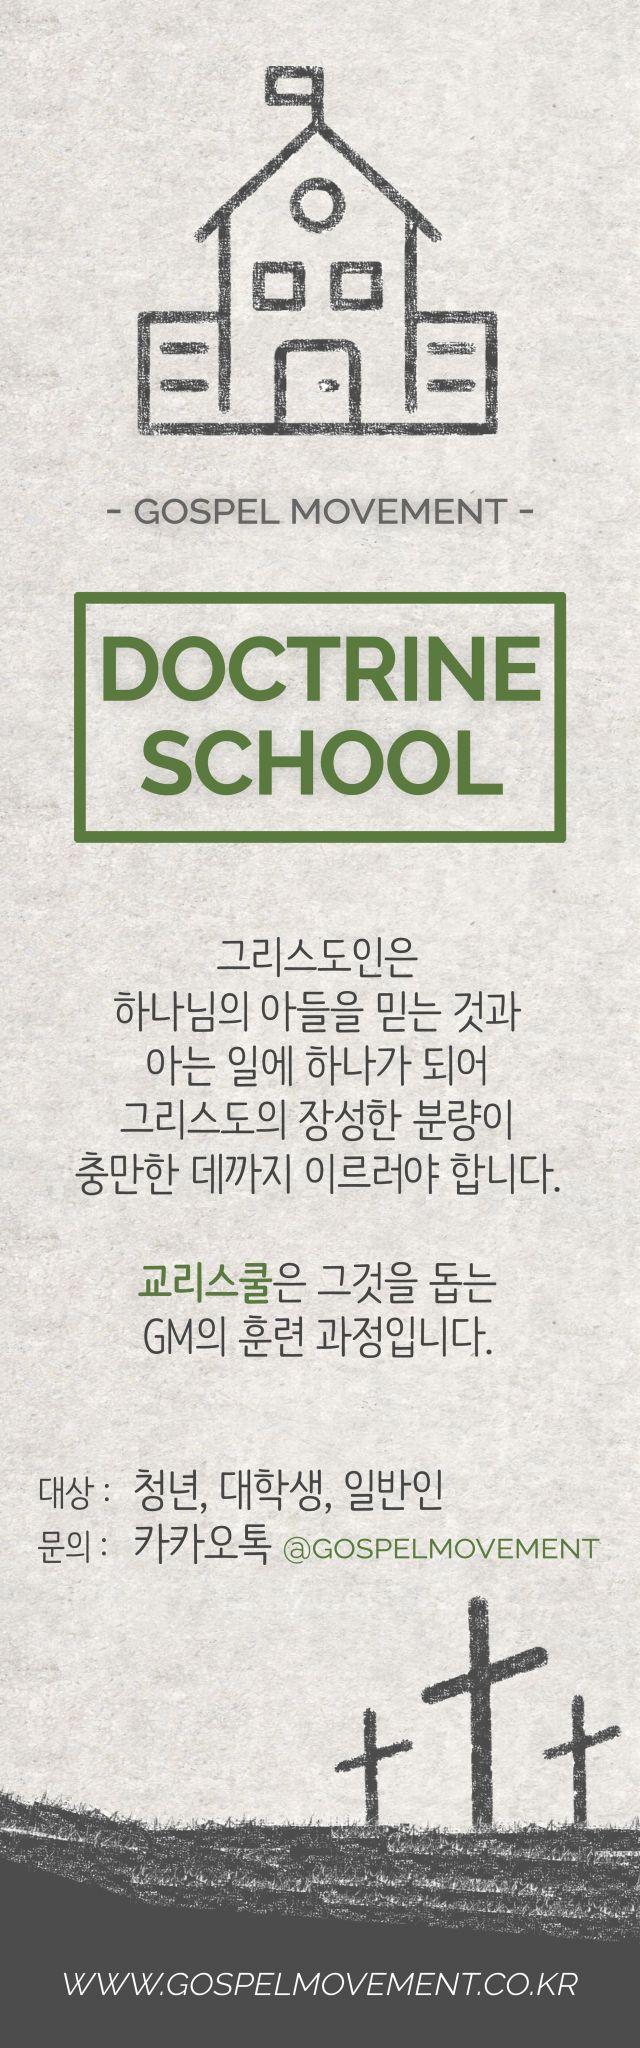 doctrine school banner_small.jpg